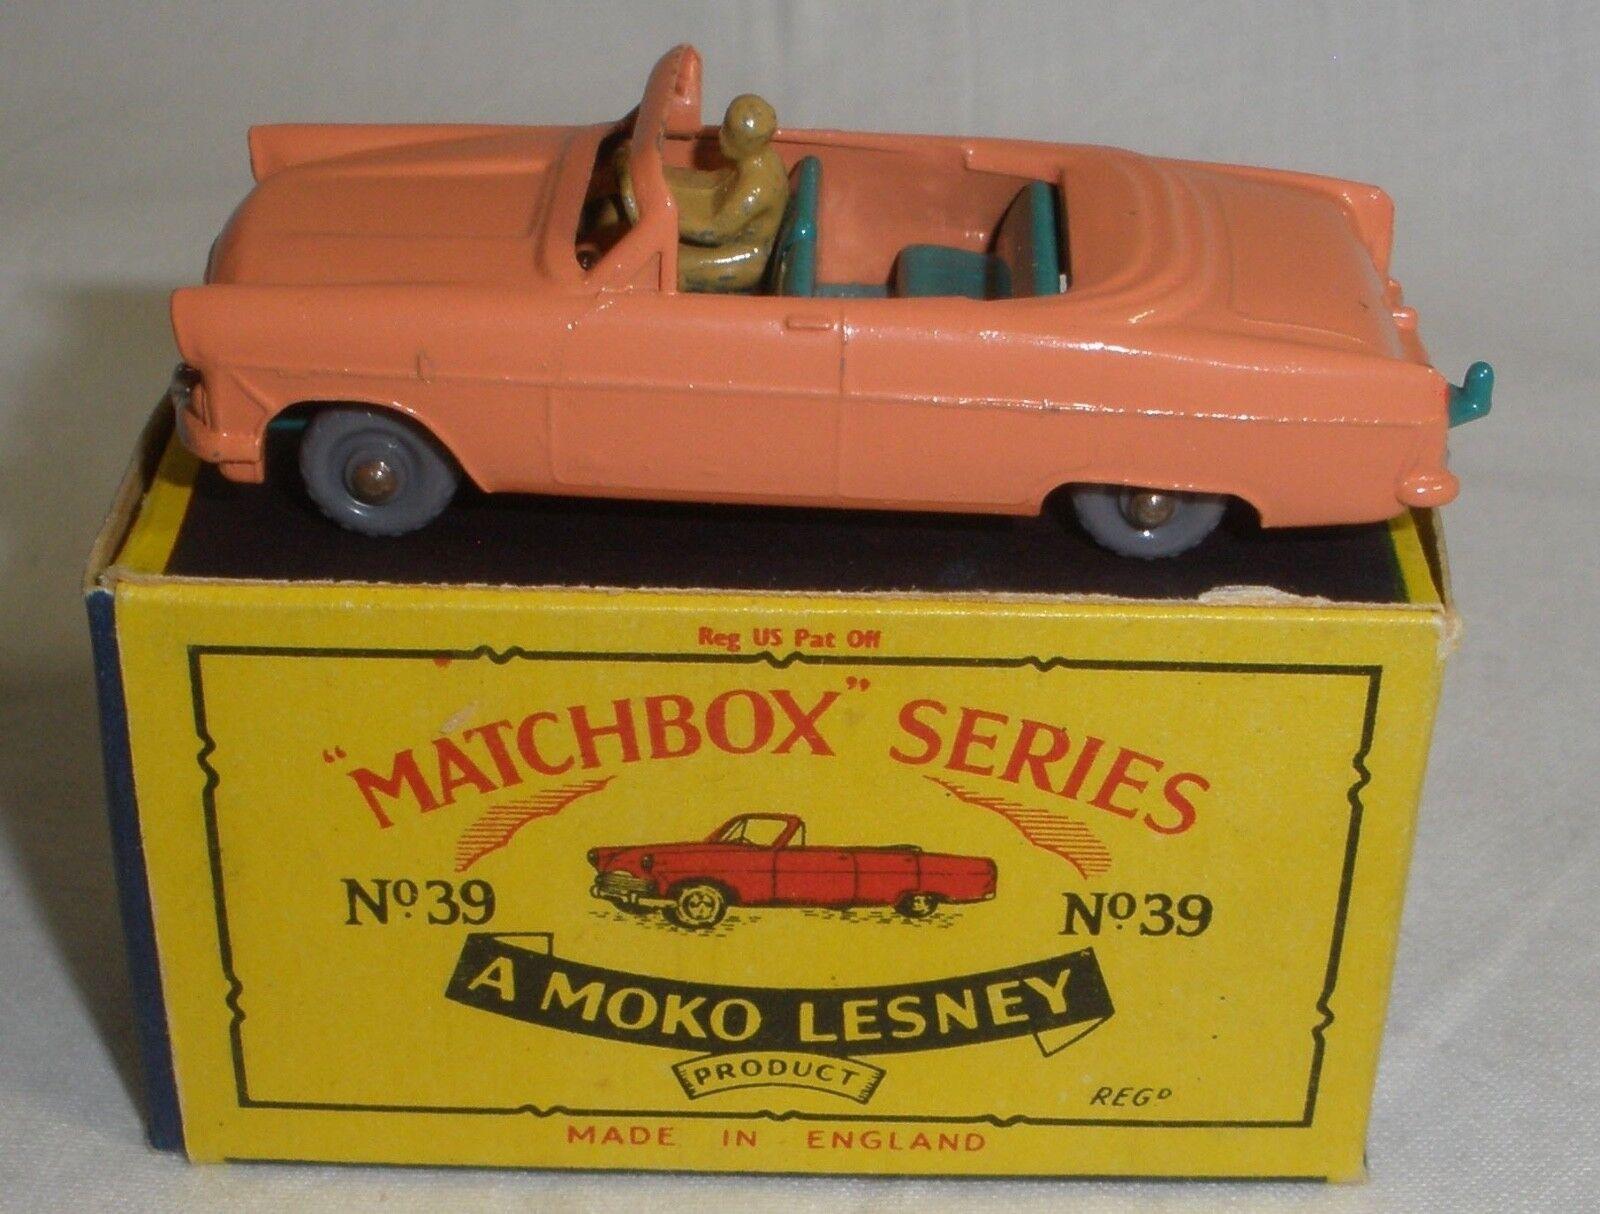 Matchbox Zodiac Congreenible Collectors Quality Condition w box